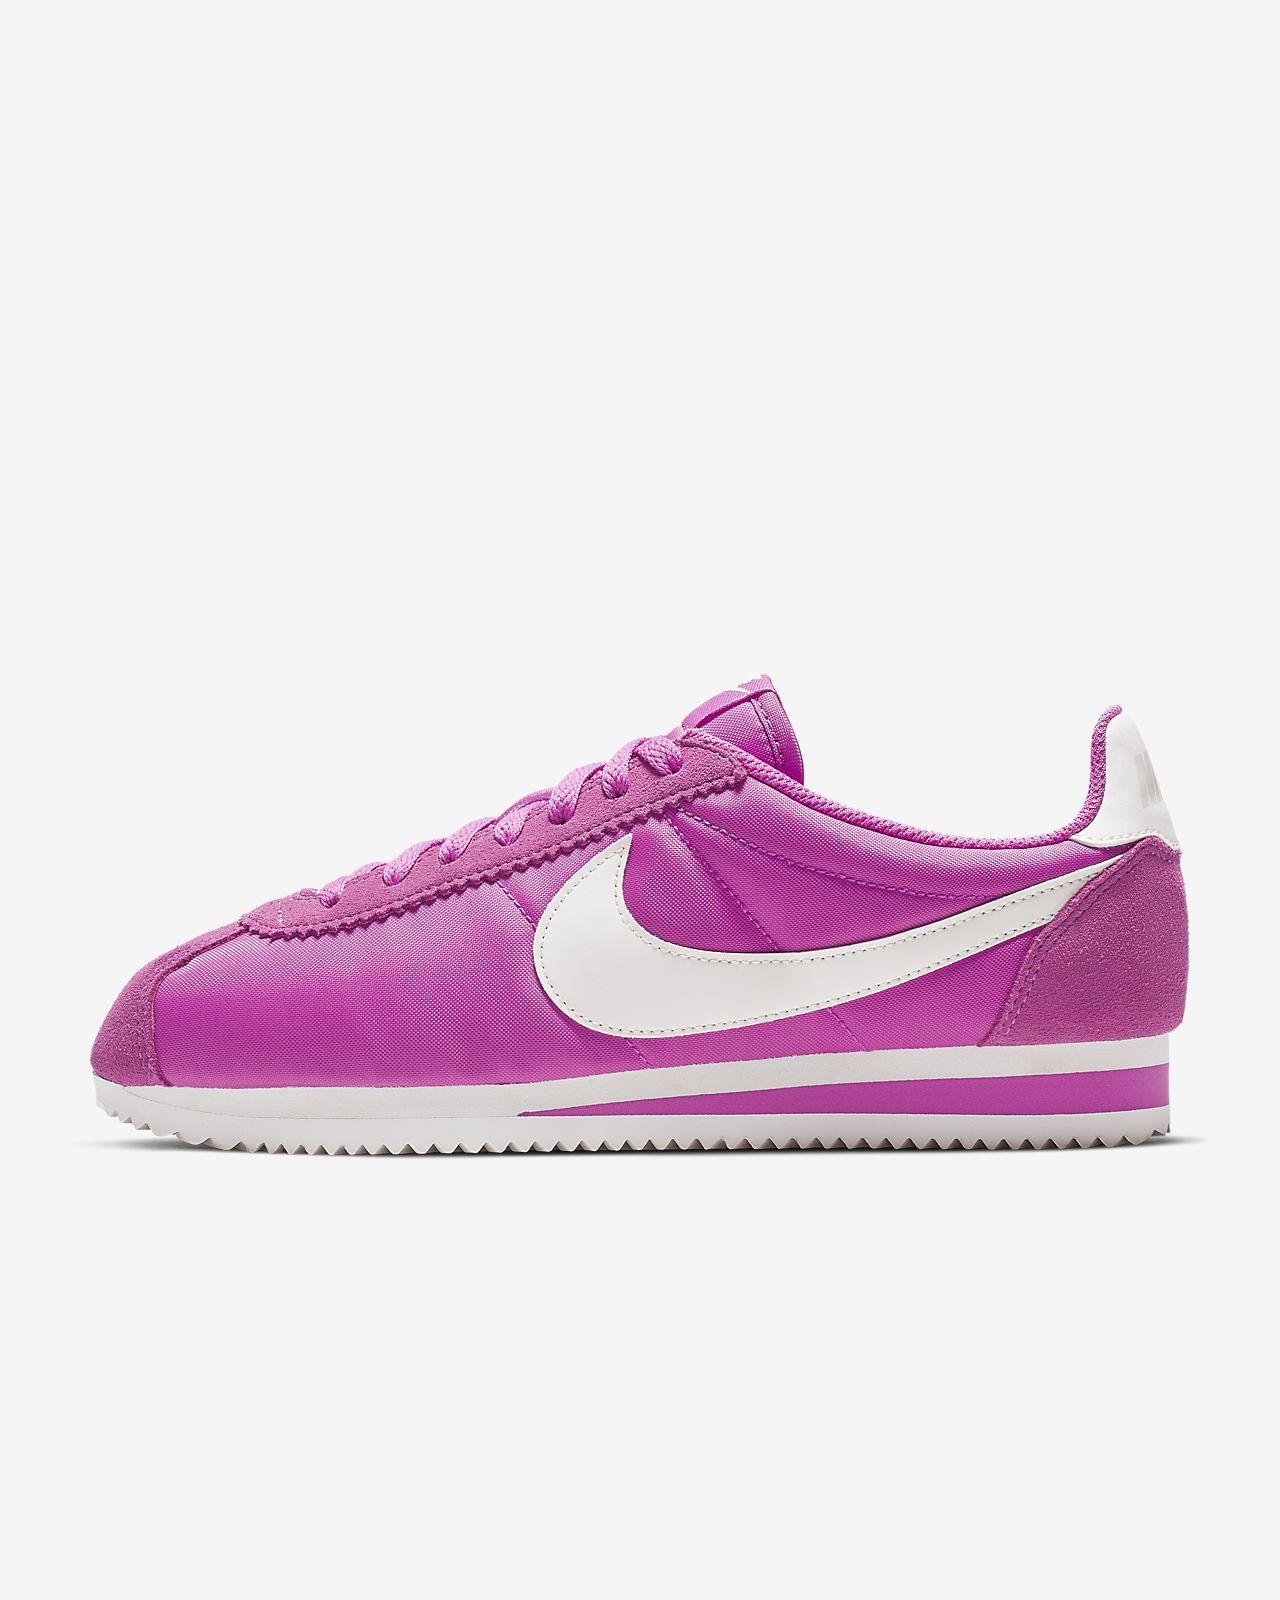 timeless design 4860b 3ac7d ... Buty damskie Nike Classic Cortez Nylon